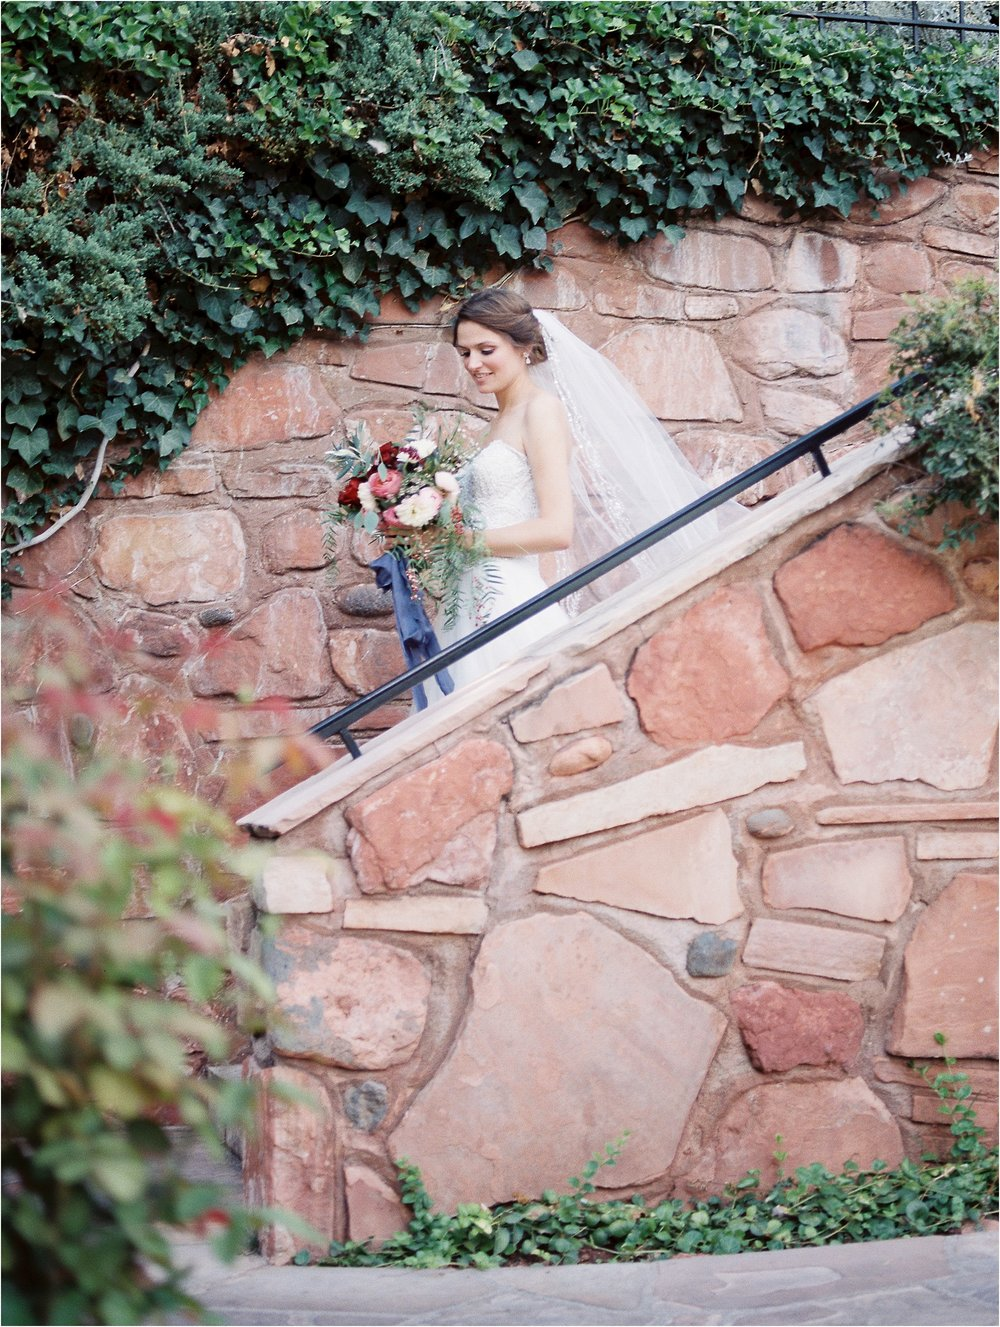 Sarah Jane Photography Film Hybrid Scottsdale Phoenix Arizona Destination Wedding Photographer sedona lauberge jon paige_0018.jpg